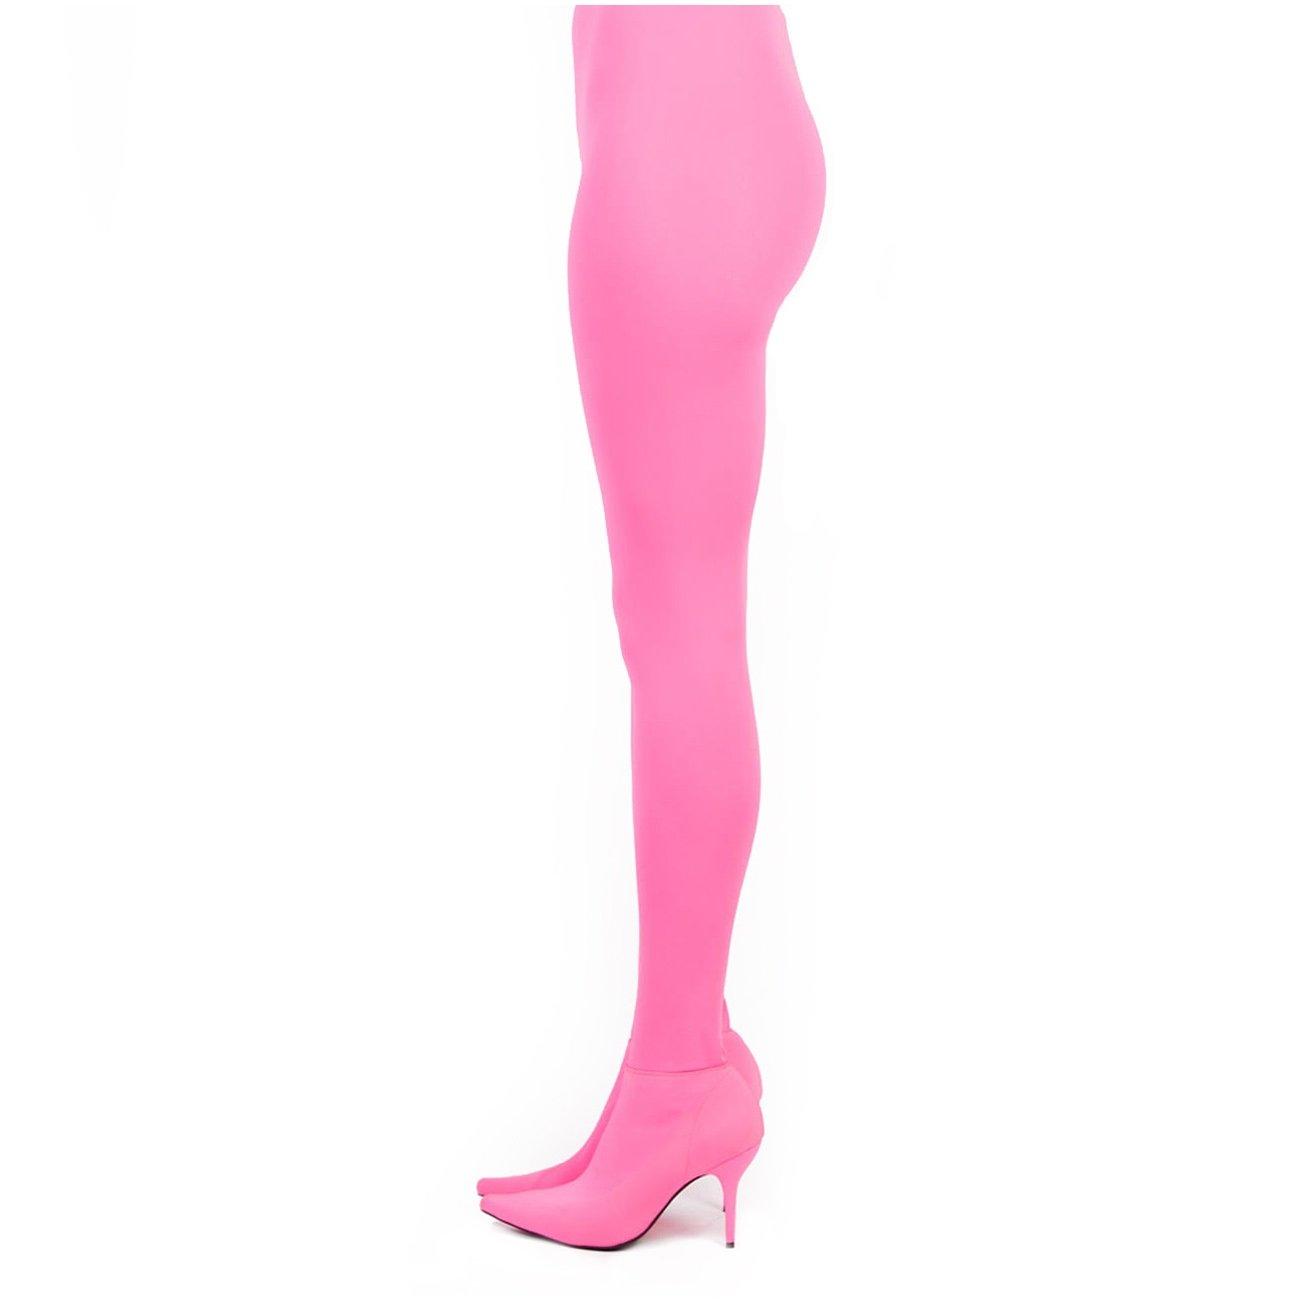 Jeffrey Campbell Bonustrack ', Pink, Pant Boot, 7.5